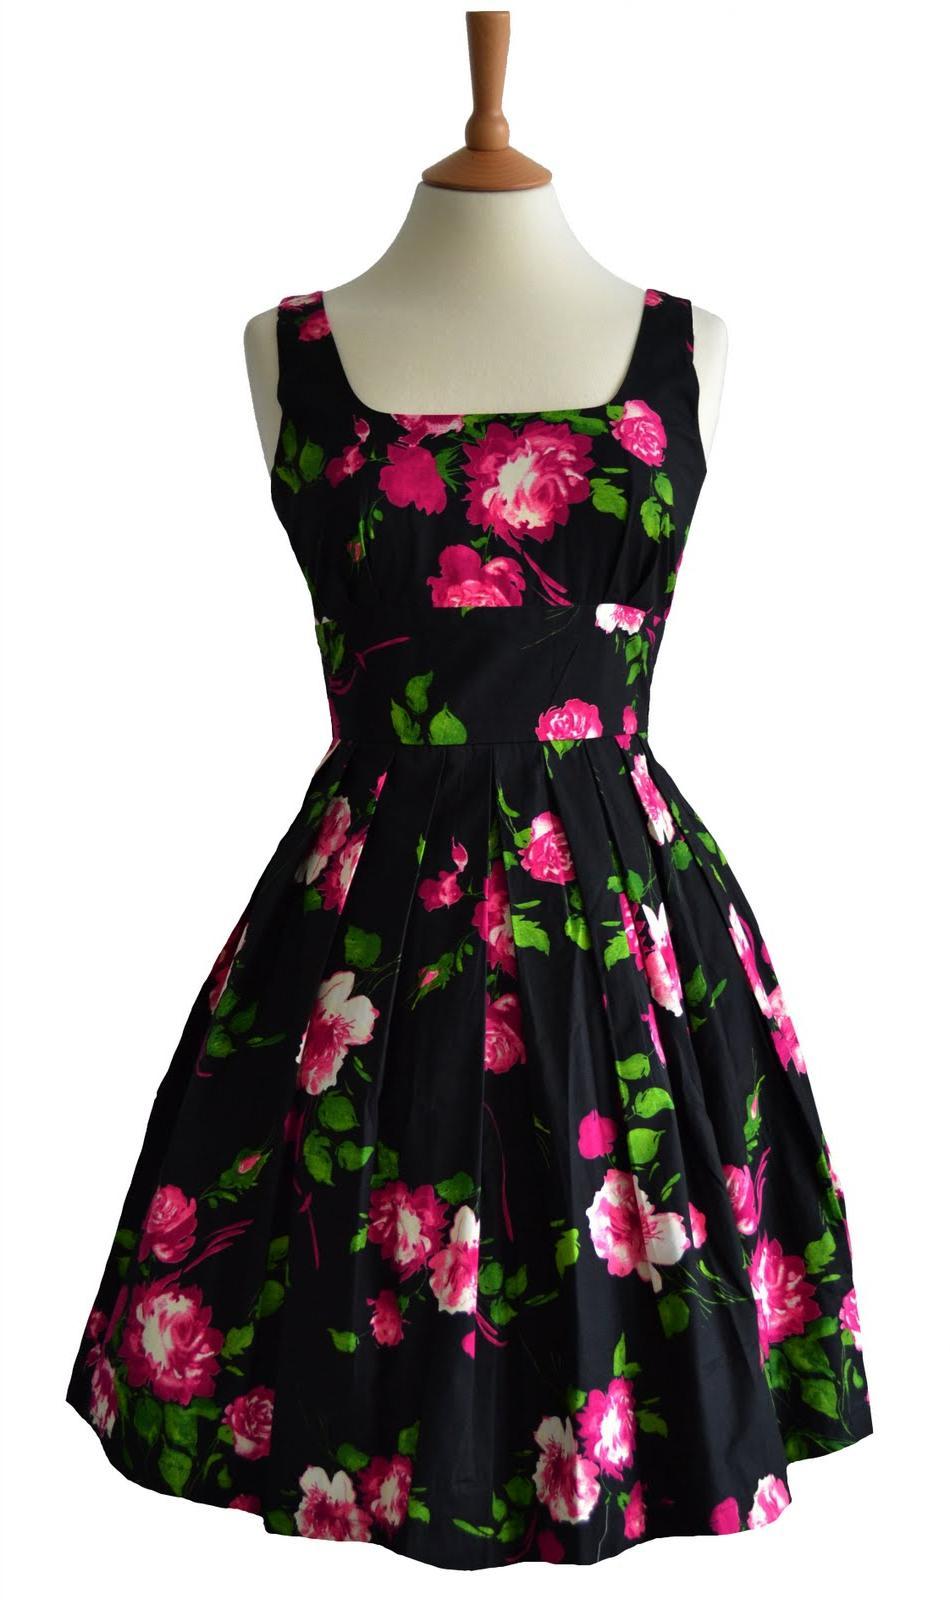 50s Vintage Style Dress - AVA